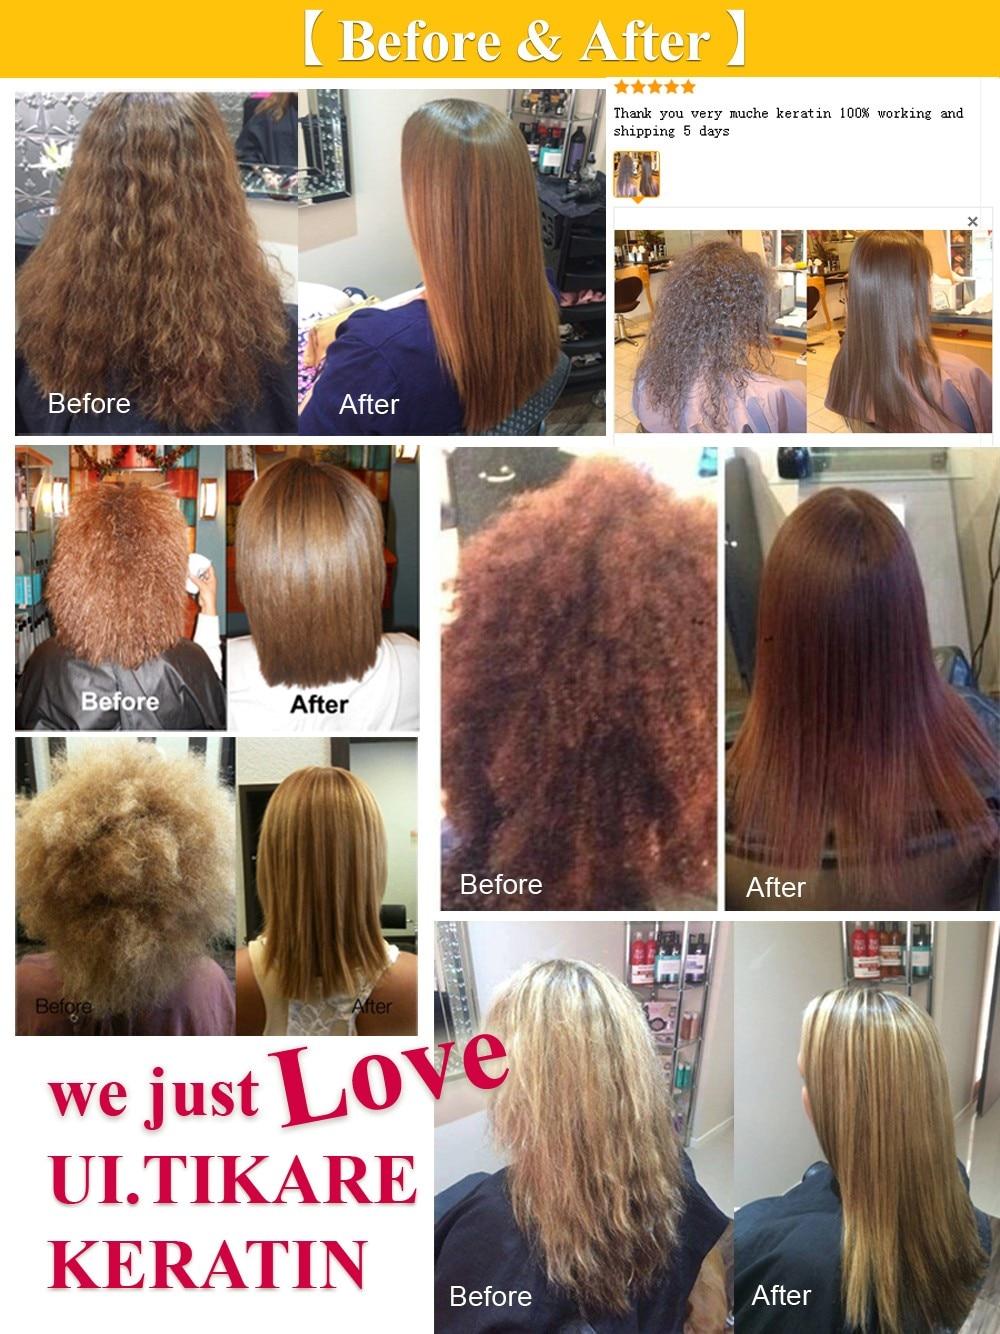 Купить с кэшбэком Keratin Hair Treatment no formaldehyde 300ml Brazilian Keratin Smoothy Shiny For Damaged Hair Treatment Eliminate frizz